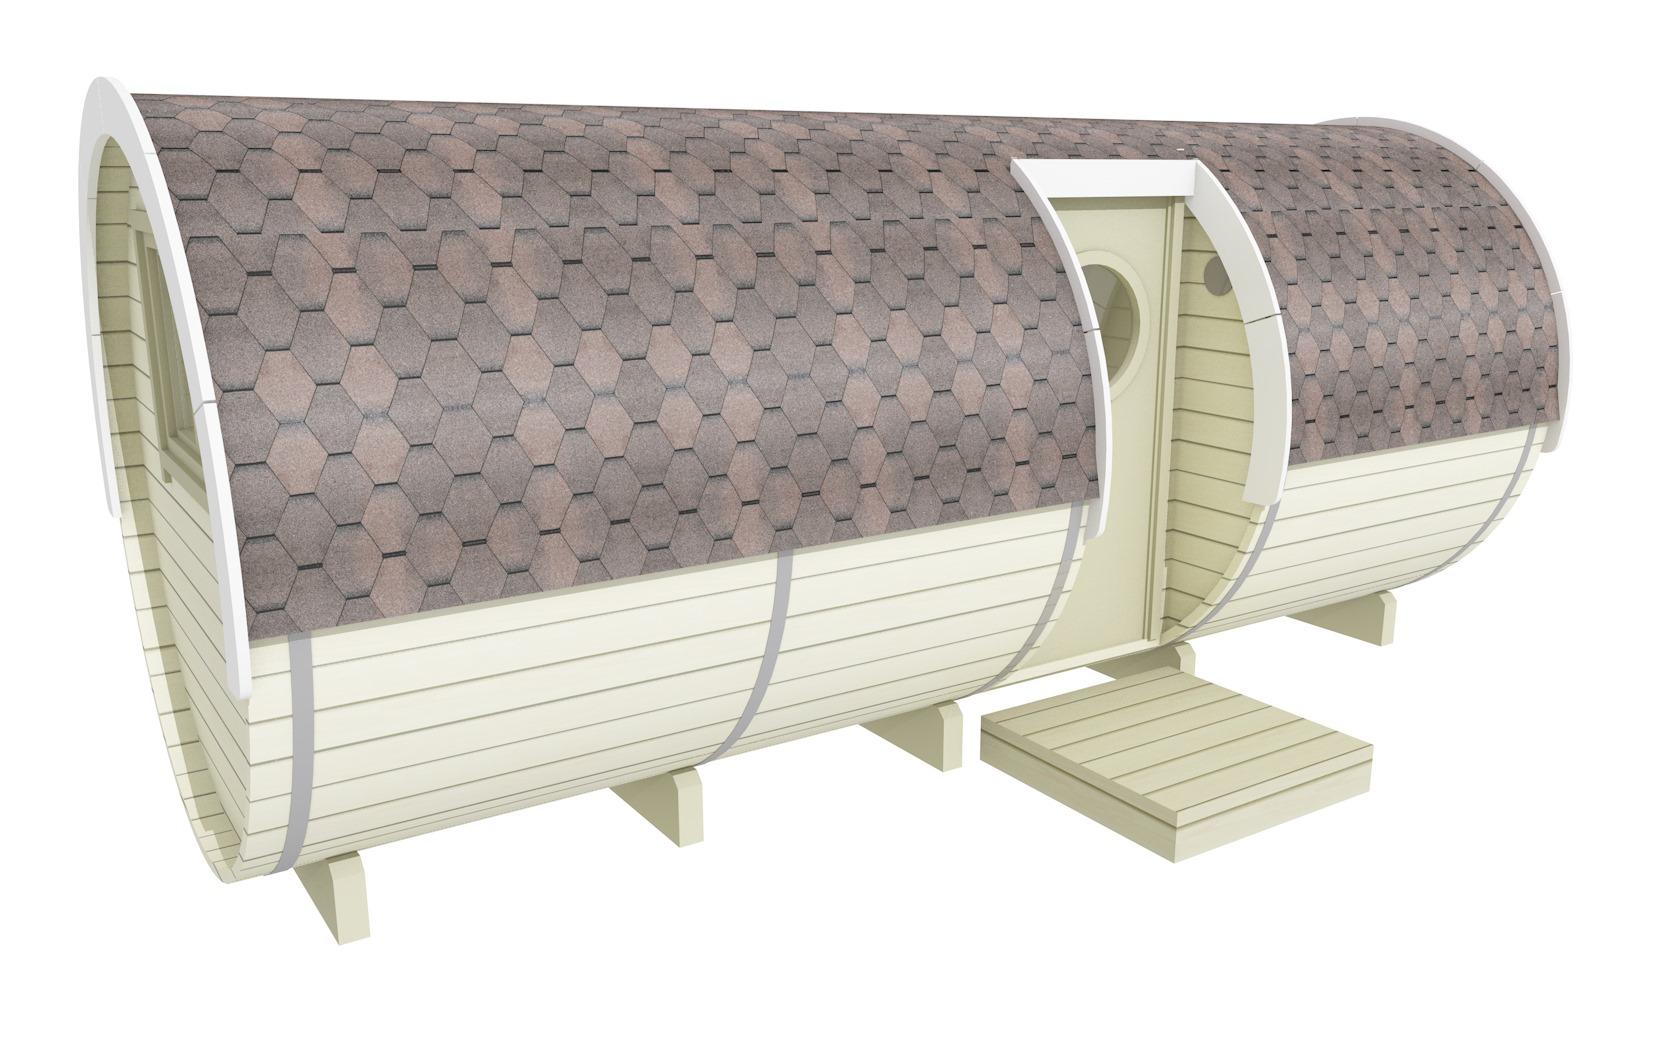 Barrel with side entrance 2.2×5.4 m.2